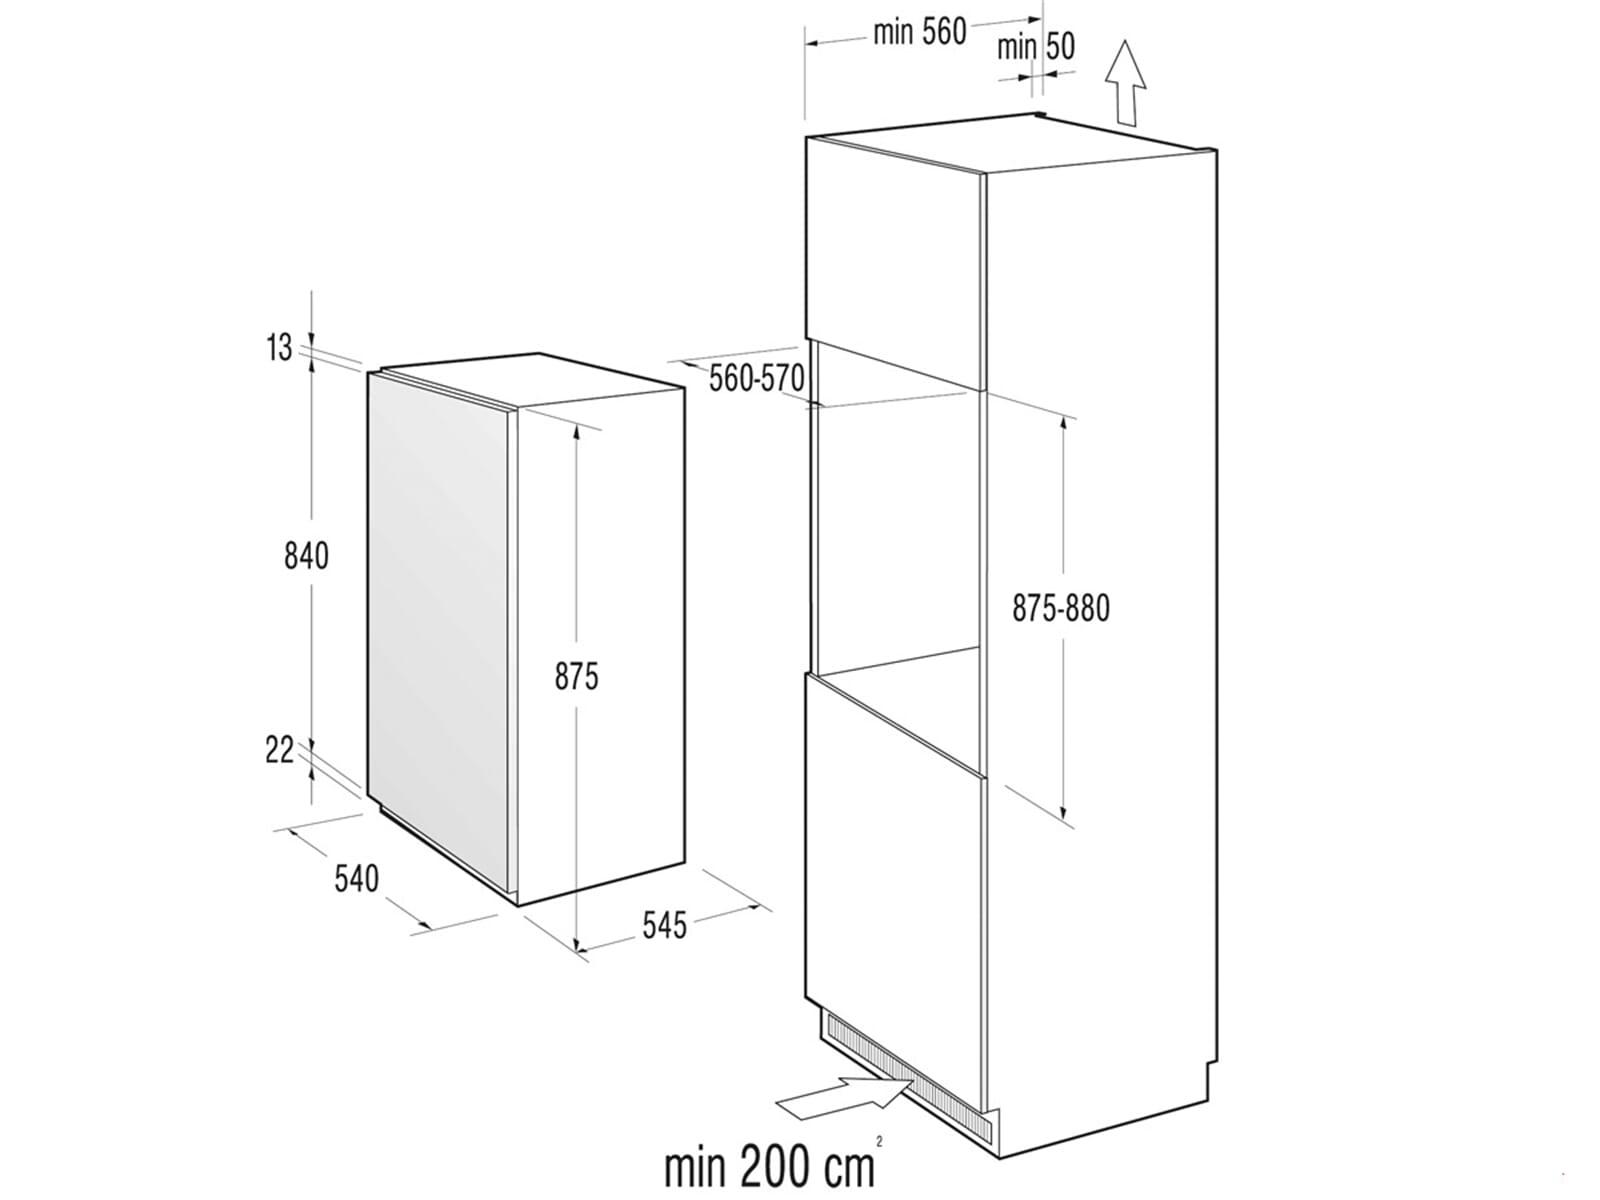 gorenje rbi 4092 aw einbauk hlschrank. Black Bedroom Furniture Sets. Home Design Ideas